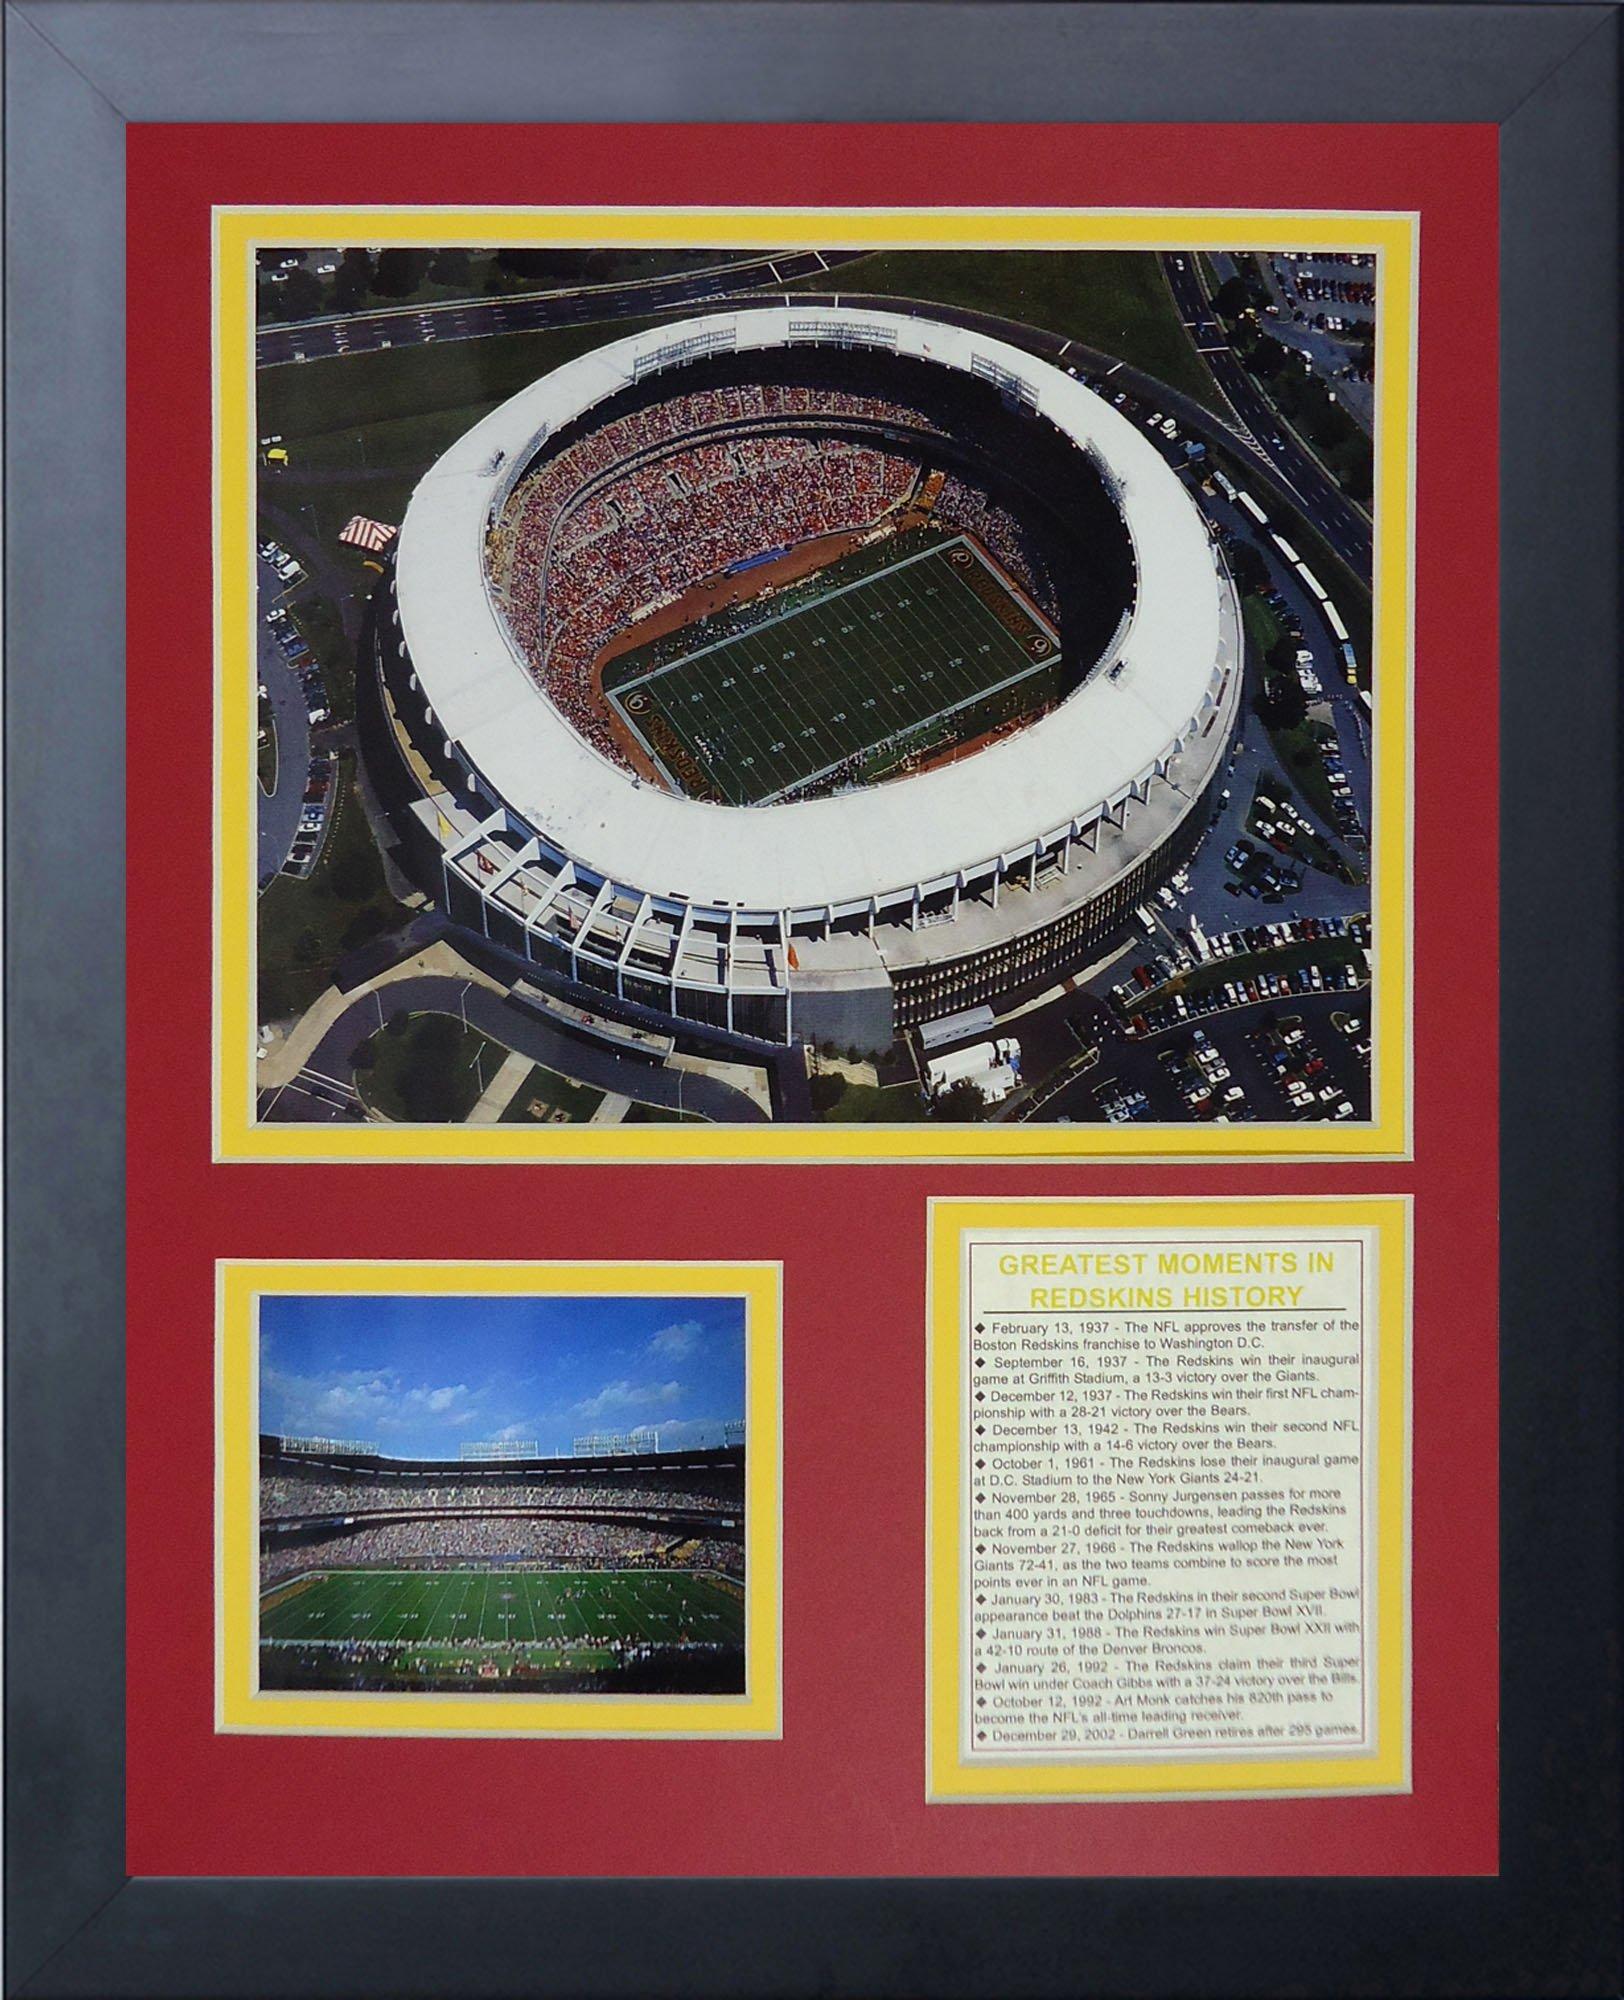 Legends Never Die RFK Stadium Framed Photo Collage, 11x14-Inch by Legends Never Die